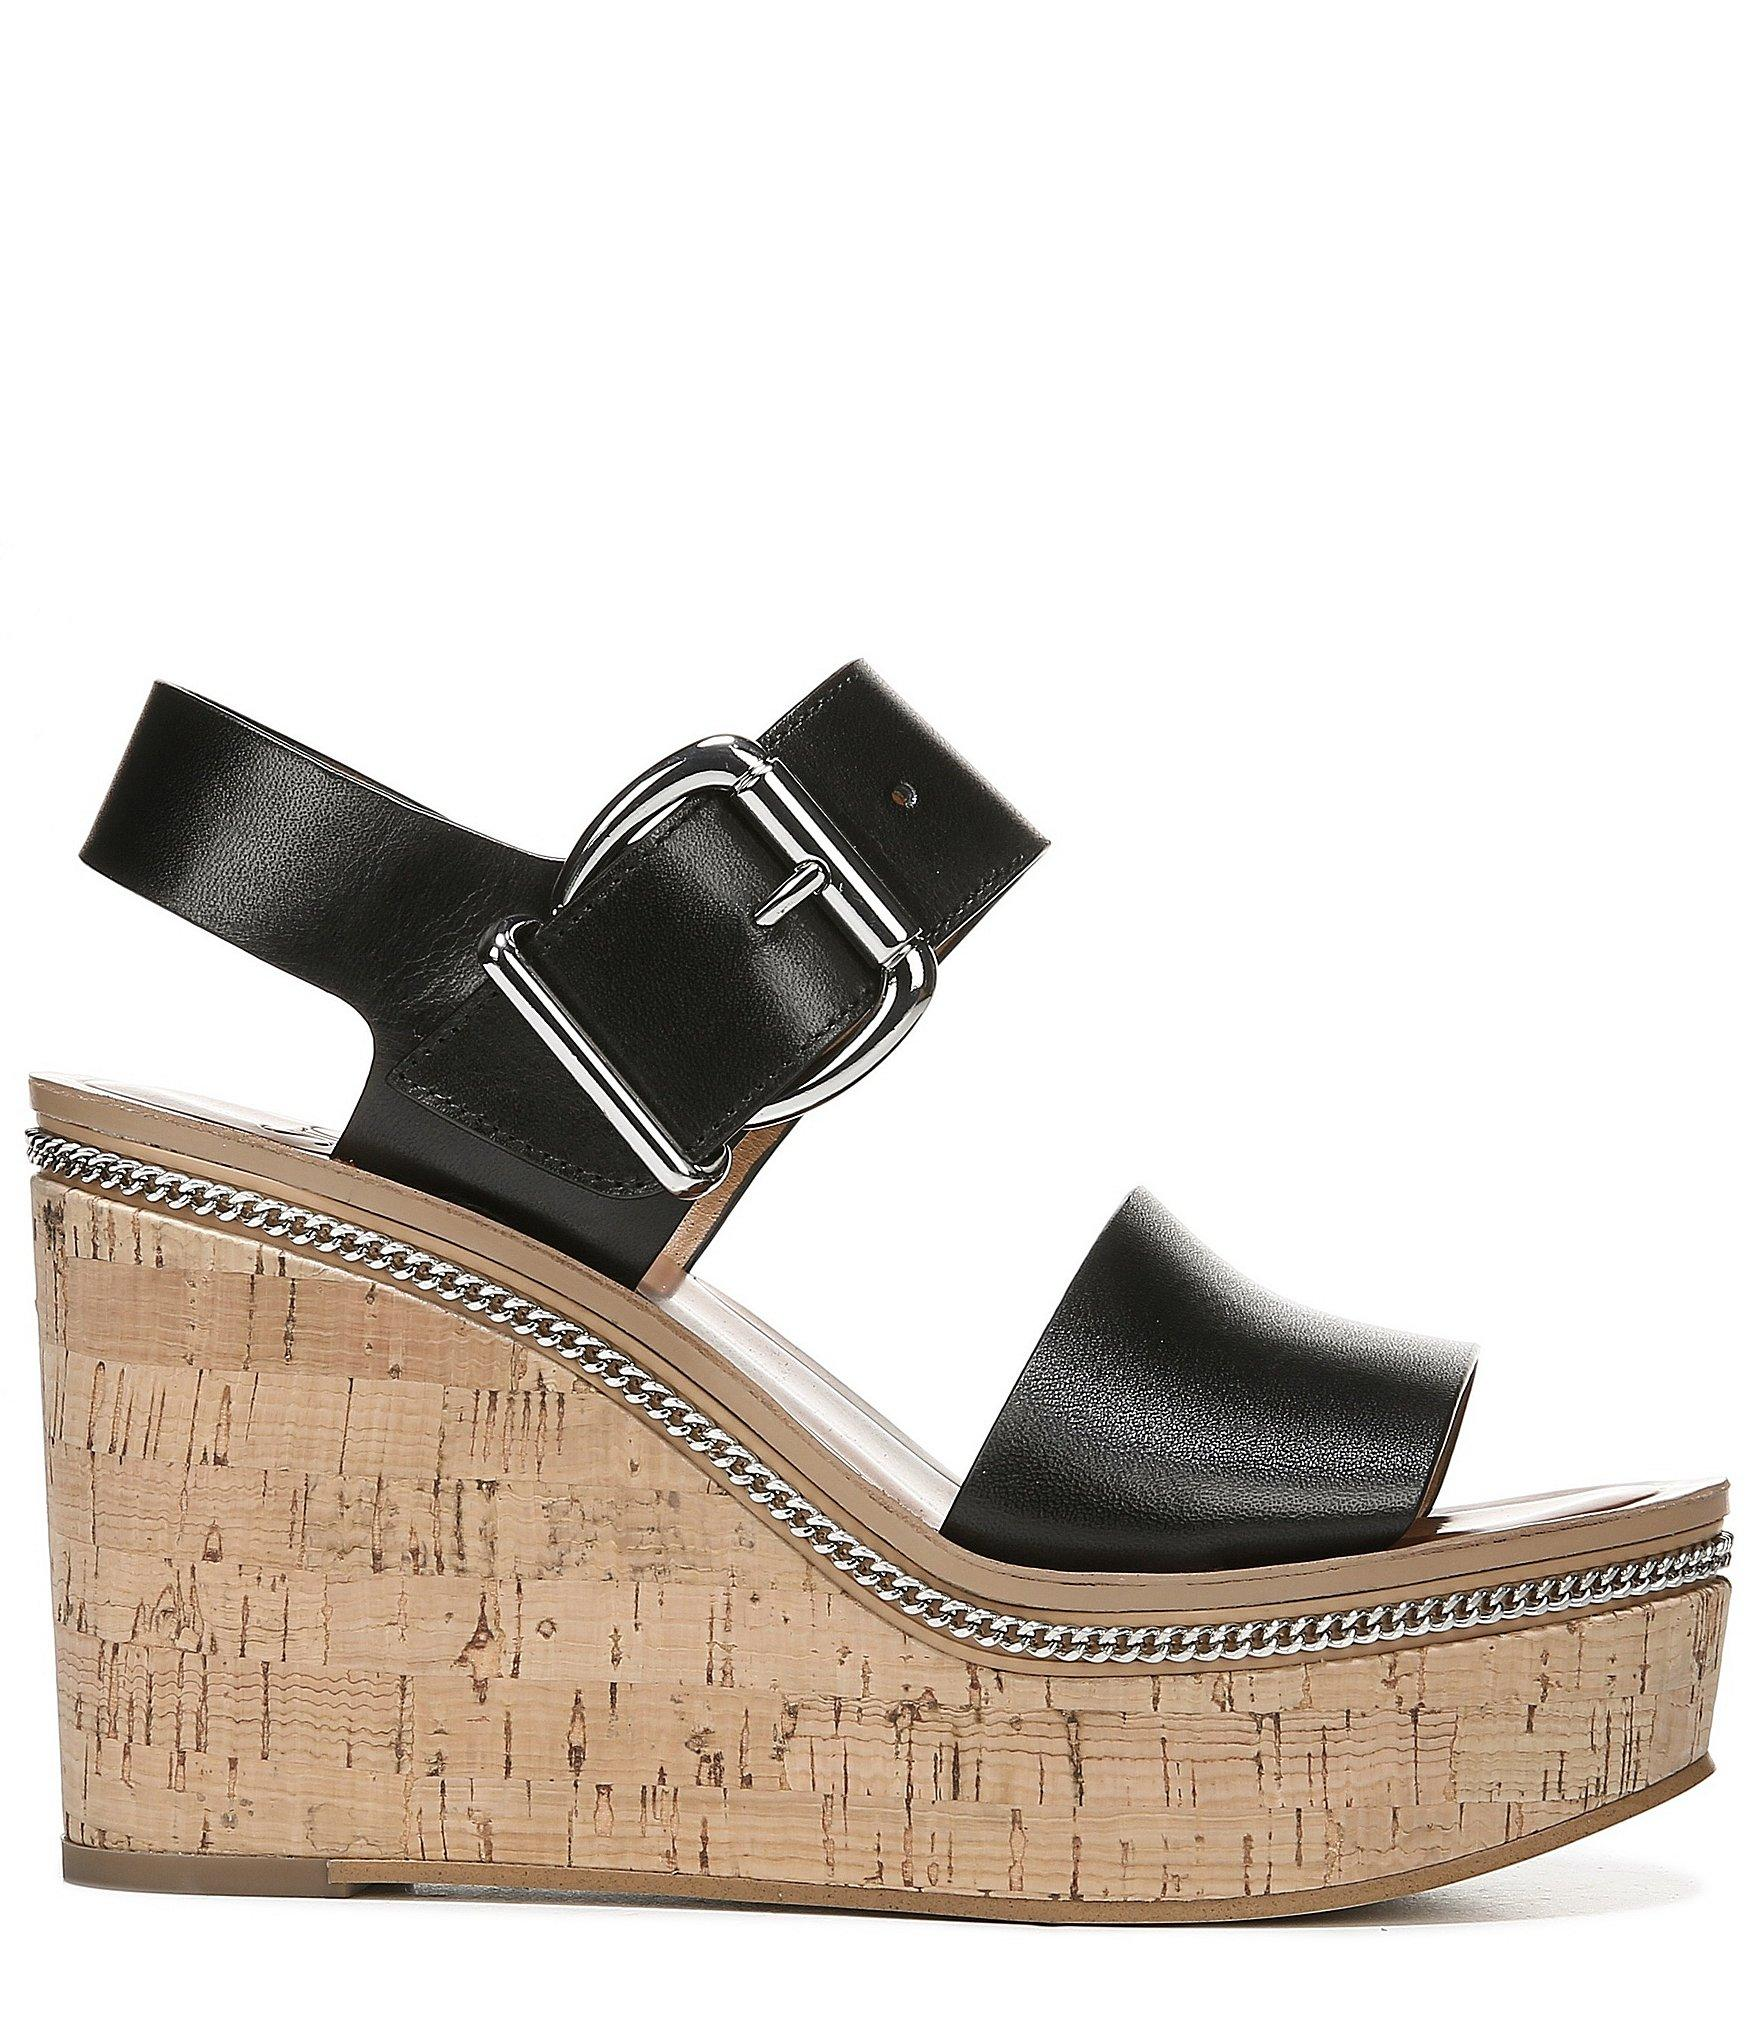 61617d971 Franco Sarto Black Sarto By Polly Leather Platform Cork Wedge Sandals. View  fullscreen